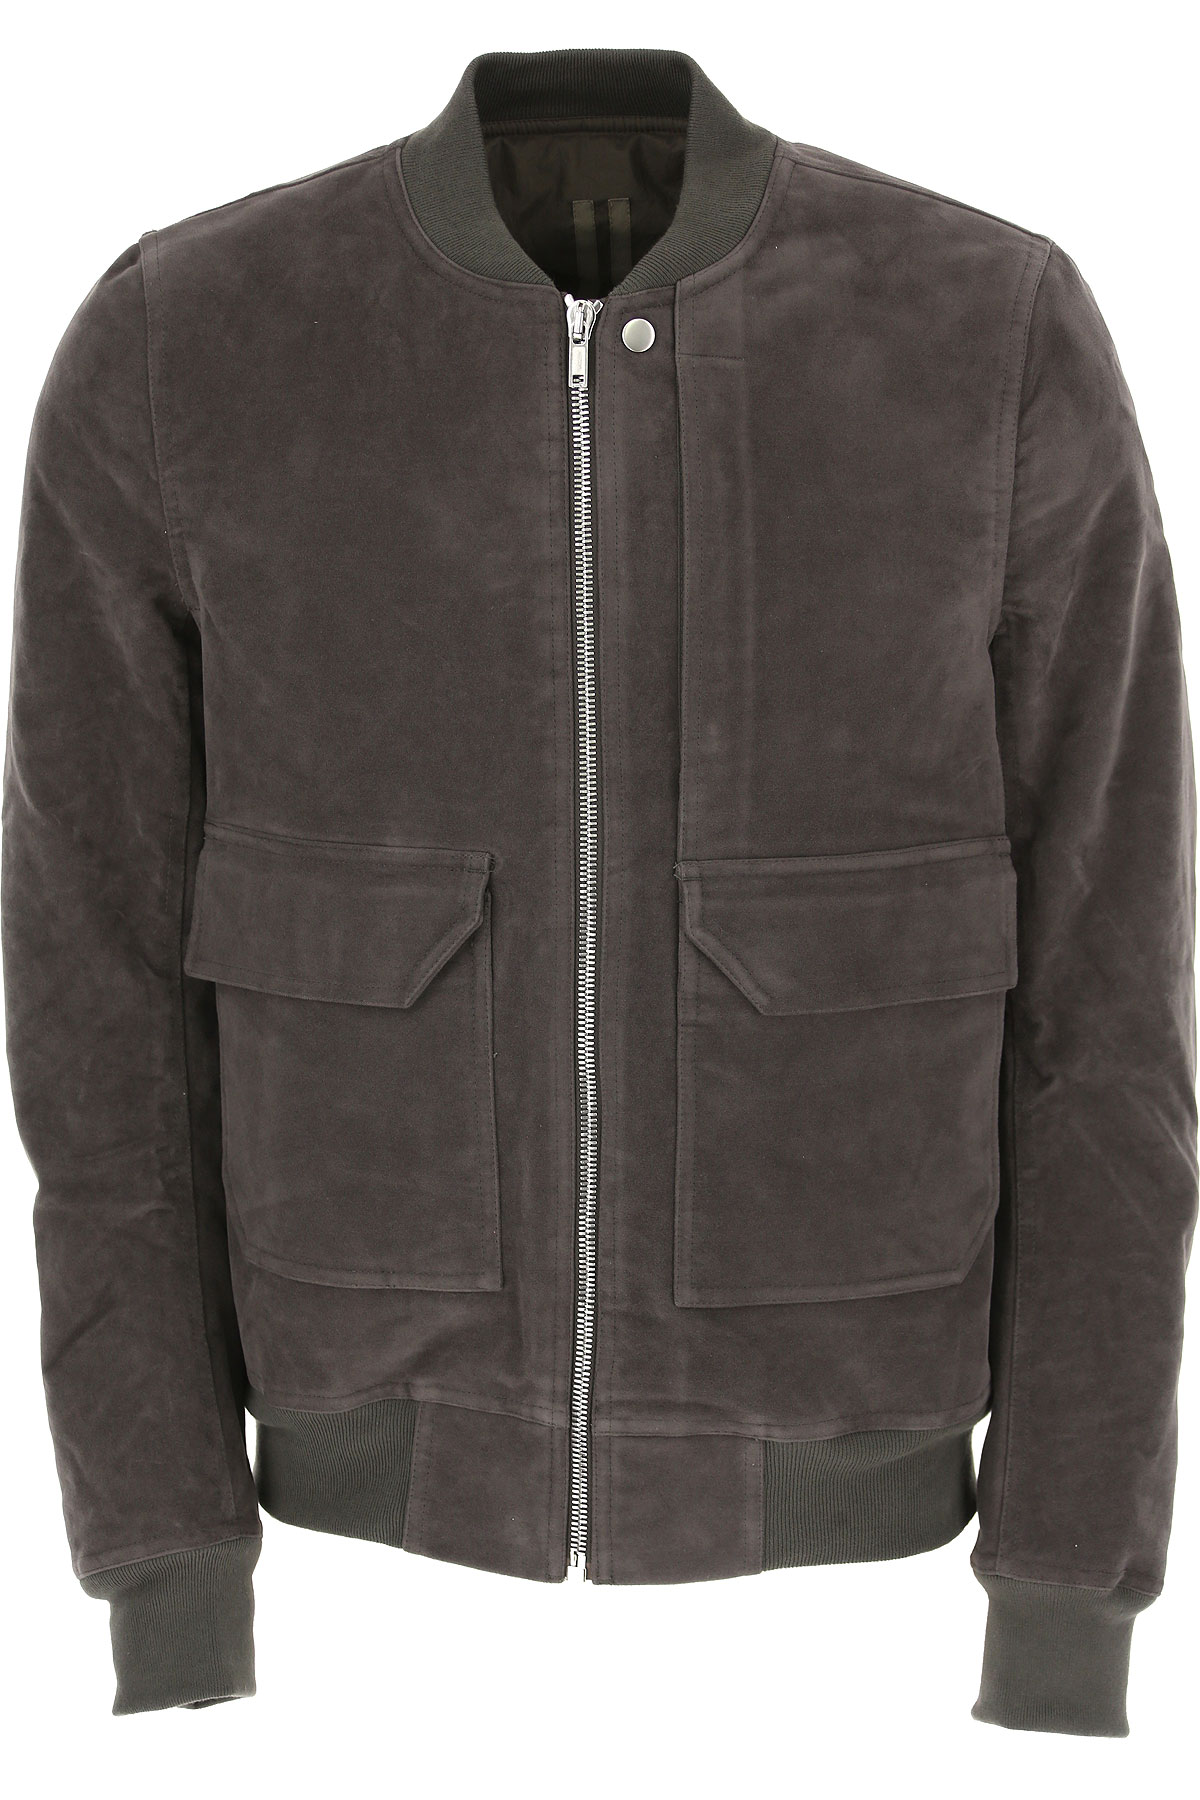 Image of Rick Owens DRKSHDW Jacket for Men, Dark Dust, Cotton, 2017, L S XL